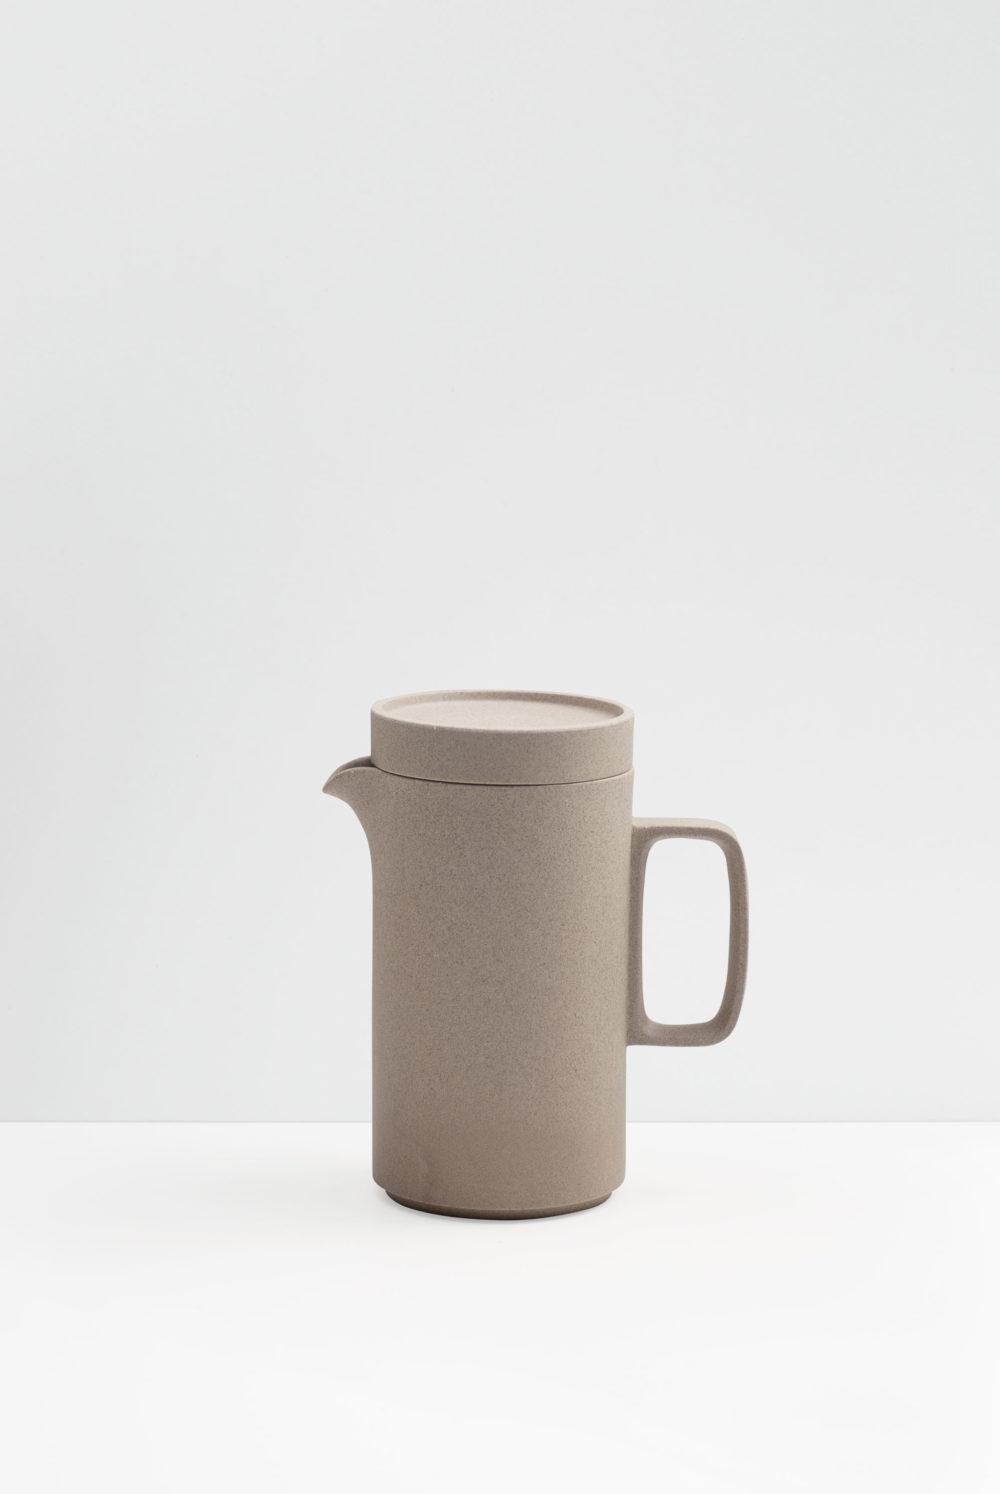 Hasami Porcelain tea pot in natural matte